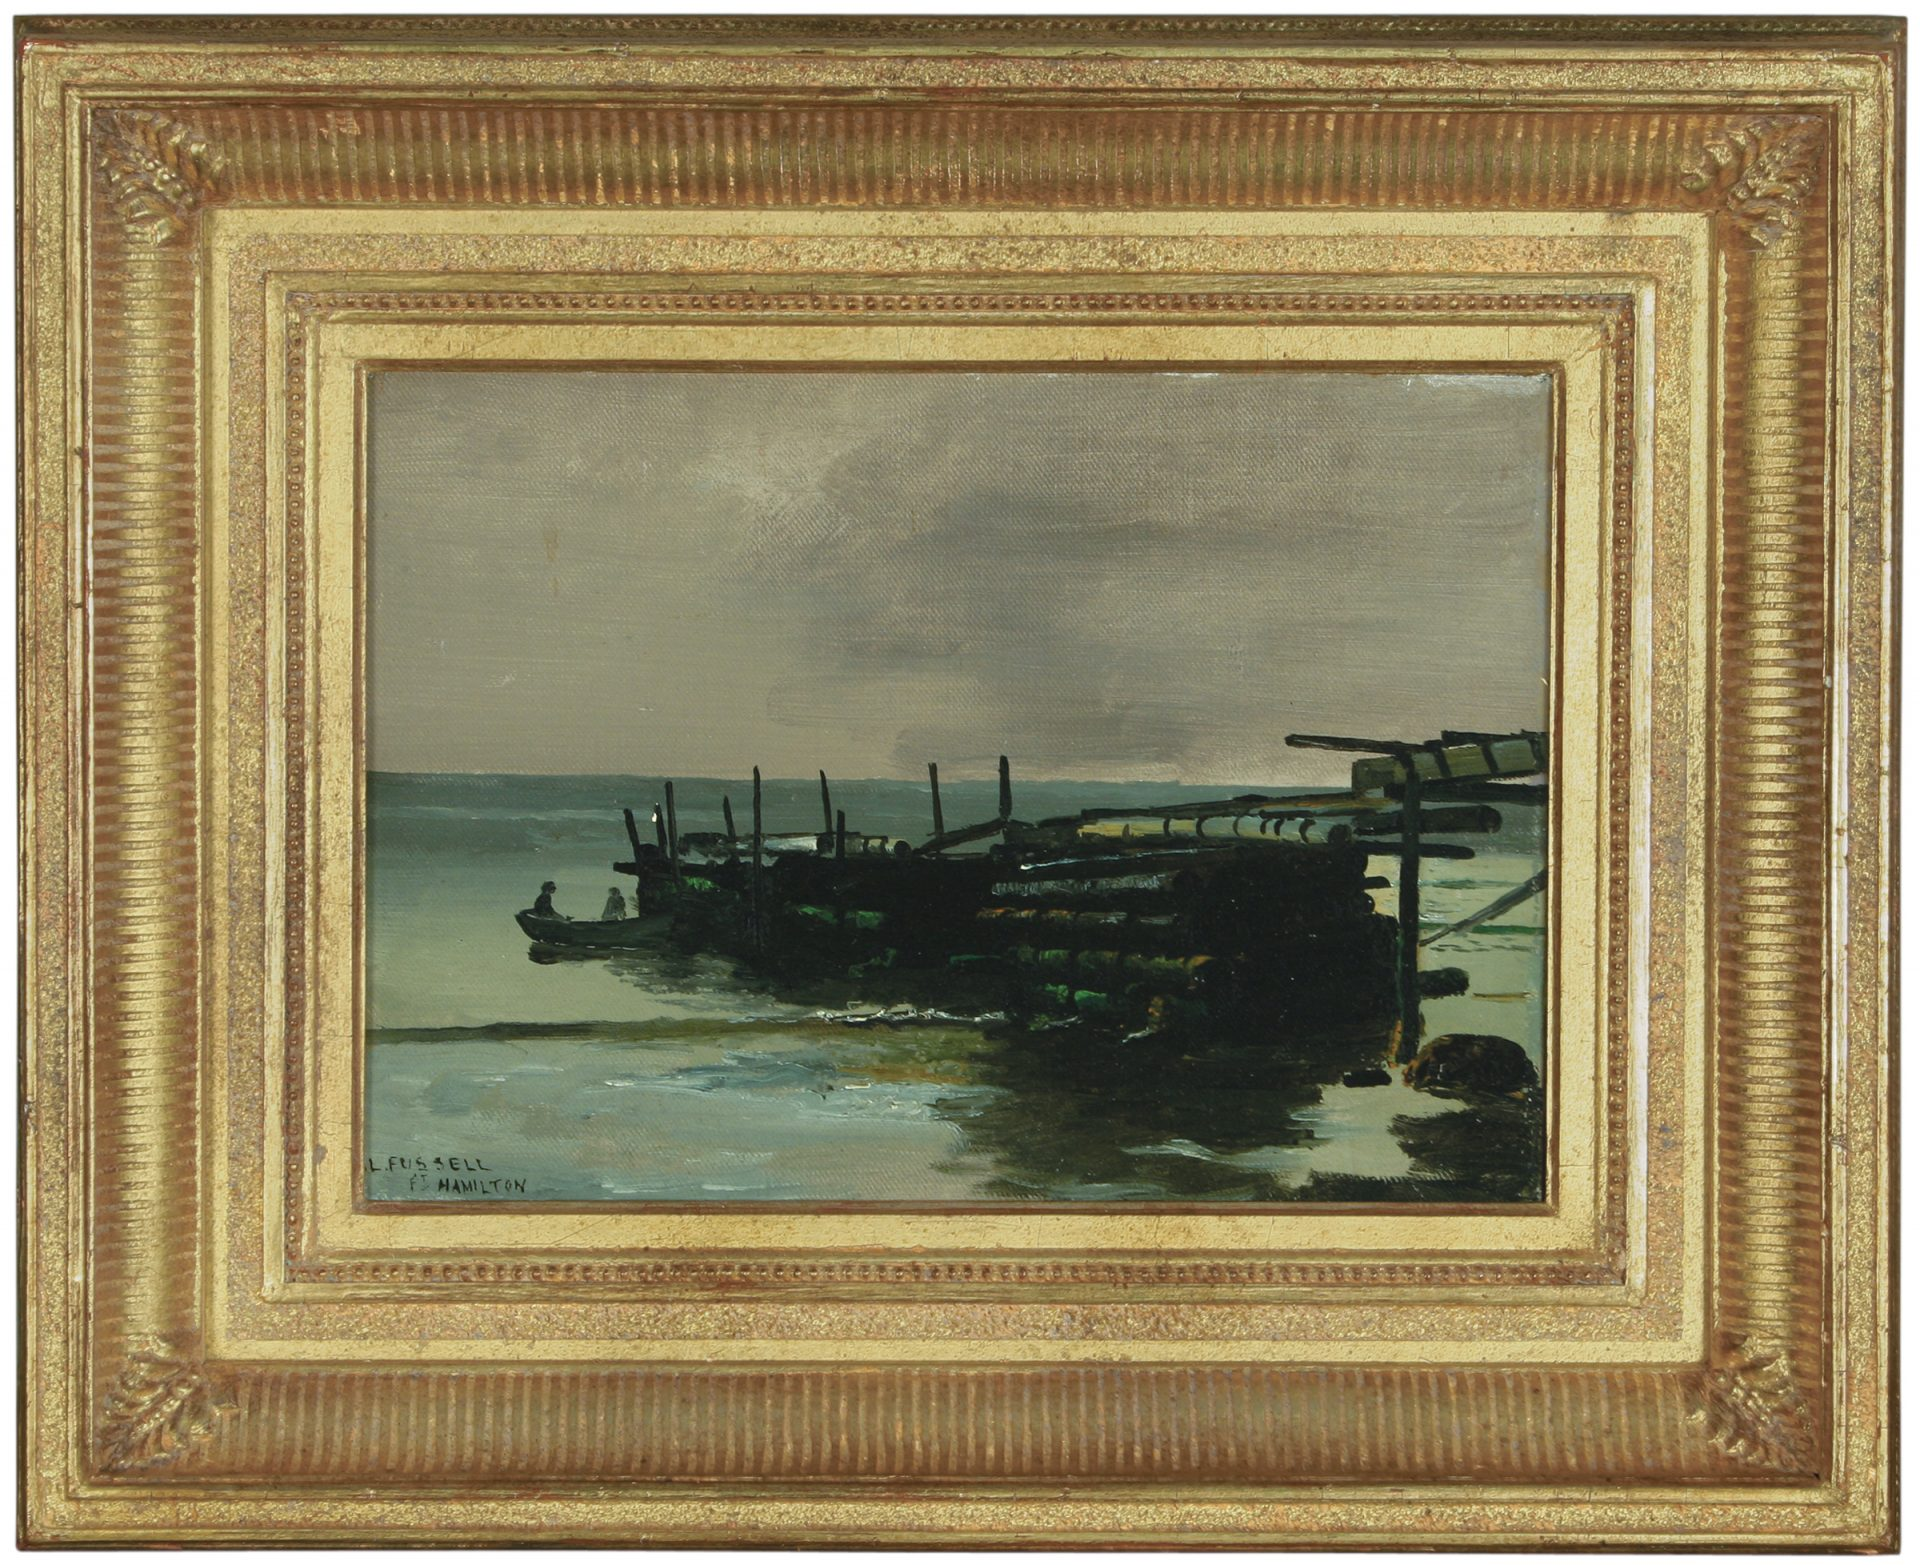 Fort Hamilton, Brooklyn FRAMED (Charles Lewis Fussell)